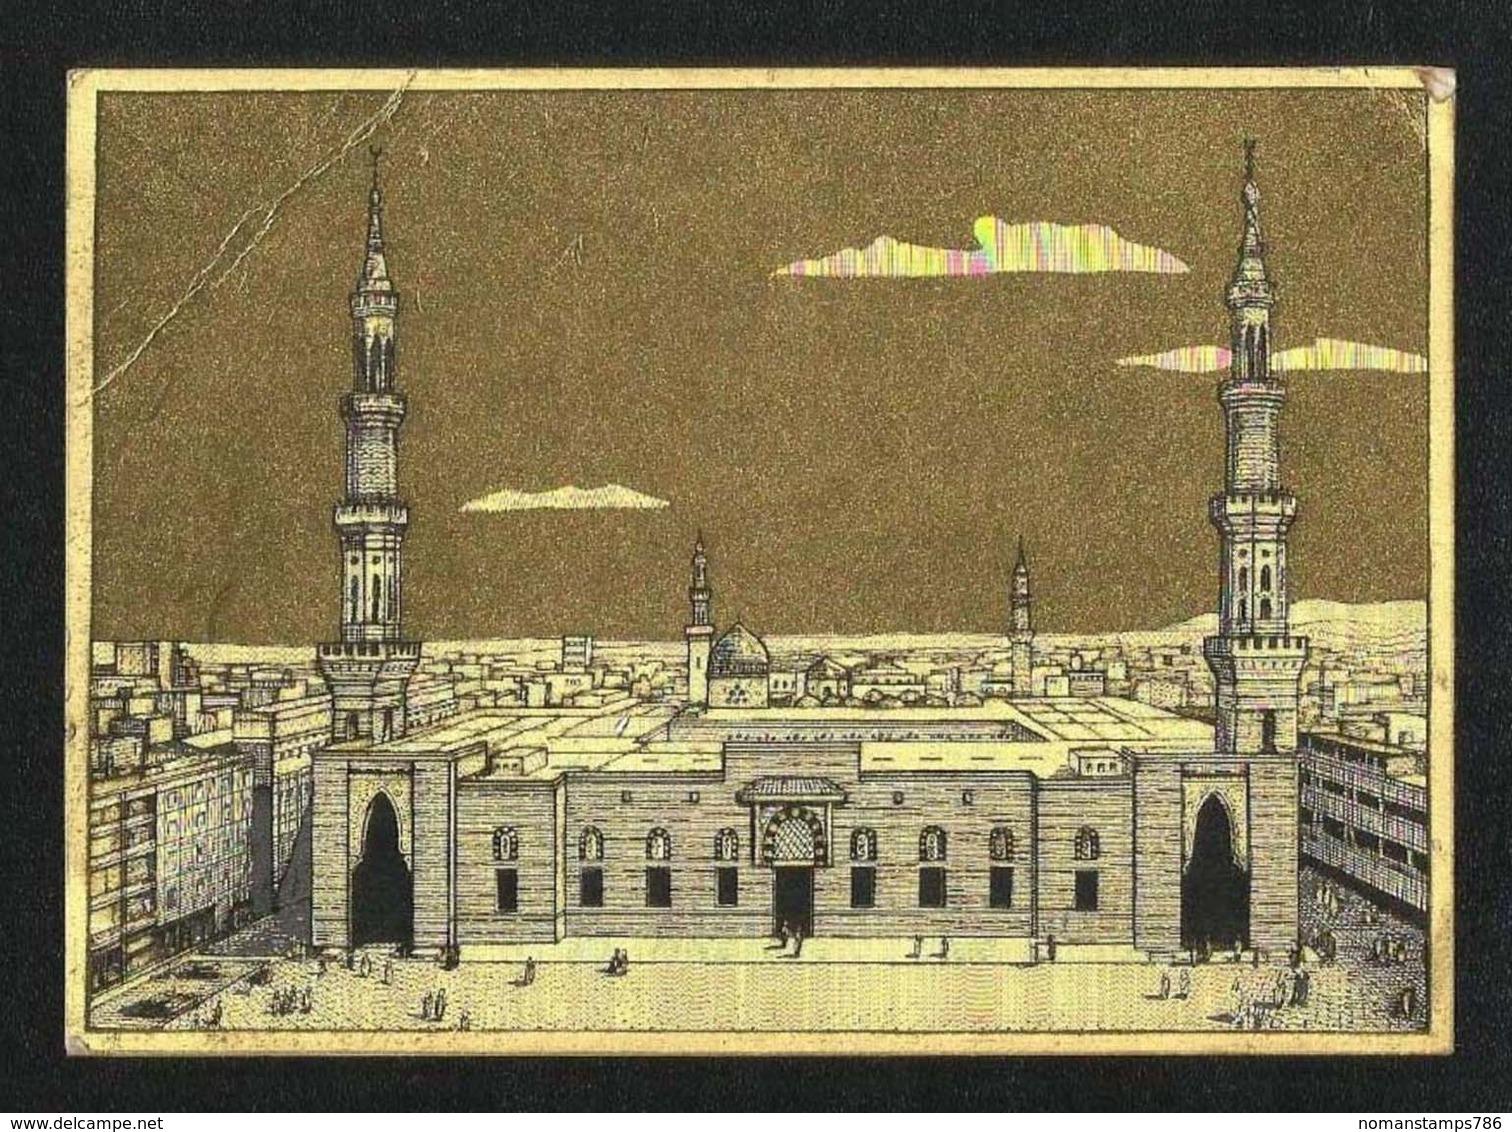 Saudi Arabia Golden Shining Picture Postcard Holy Mosque Medina View Card - Saudi Arabia